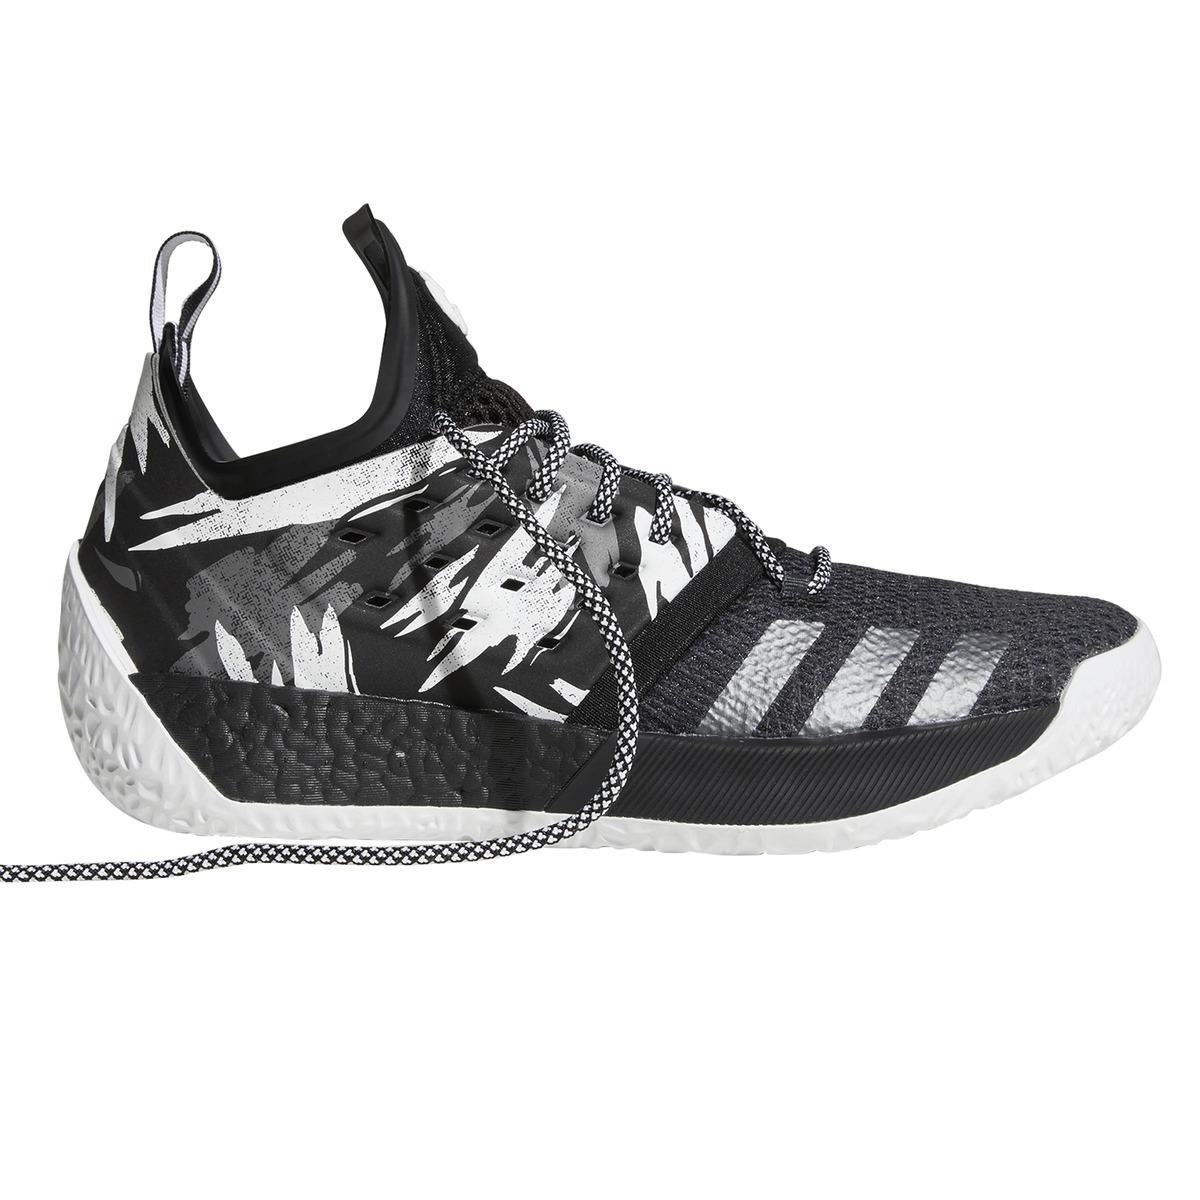 0b2360cbd2e Adidas Harden Vol 2 Basketball Boots in Black for Men - Lyst